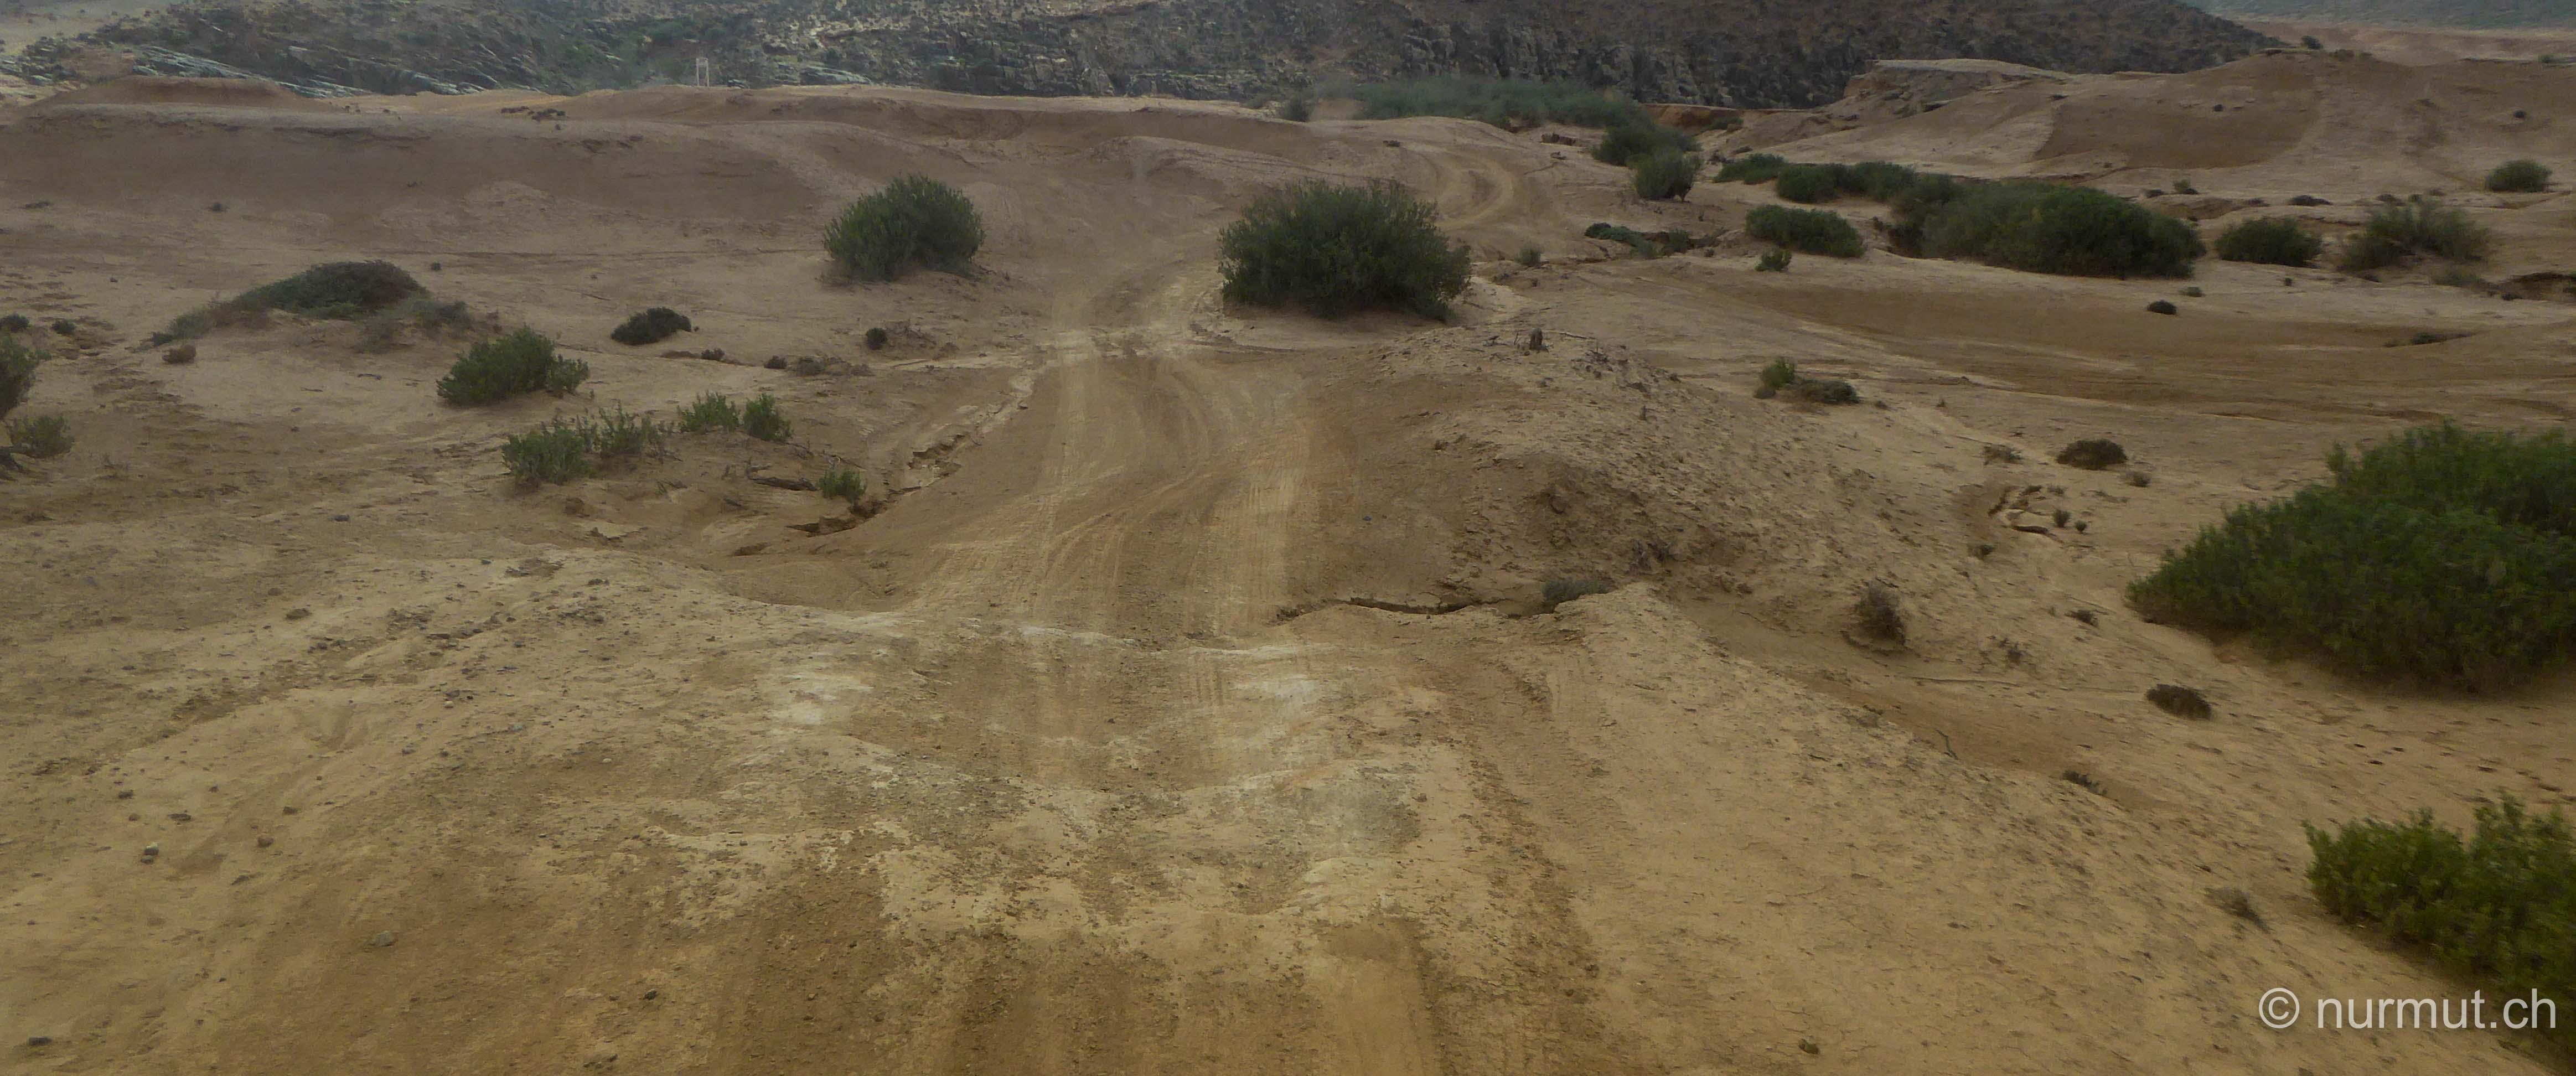 im winter in marokko-piste-offroad fahren-marokko